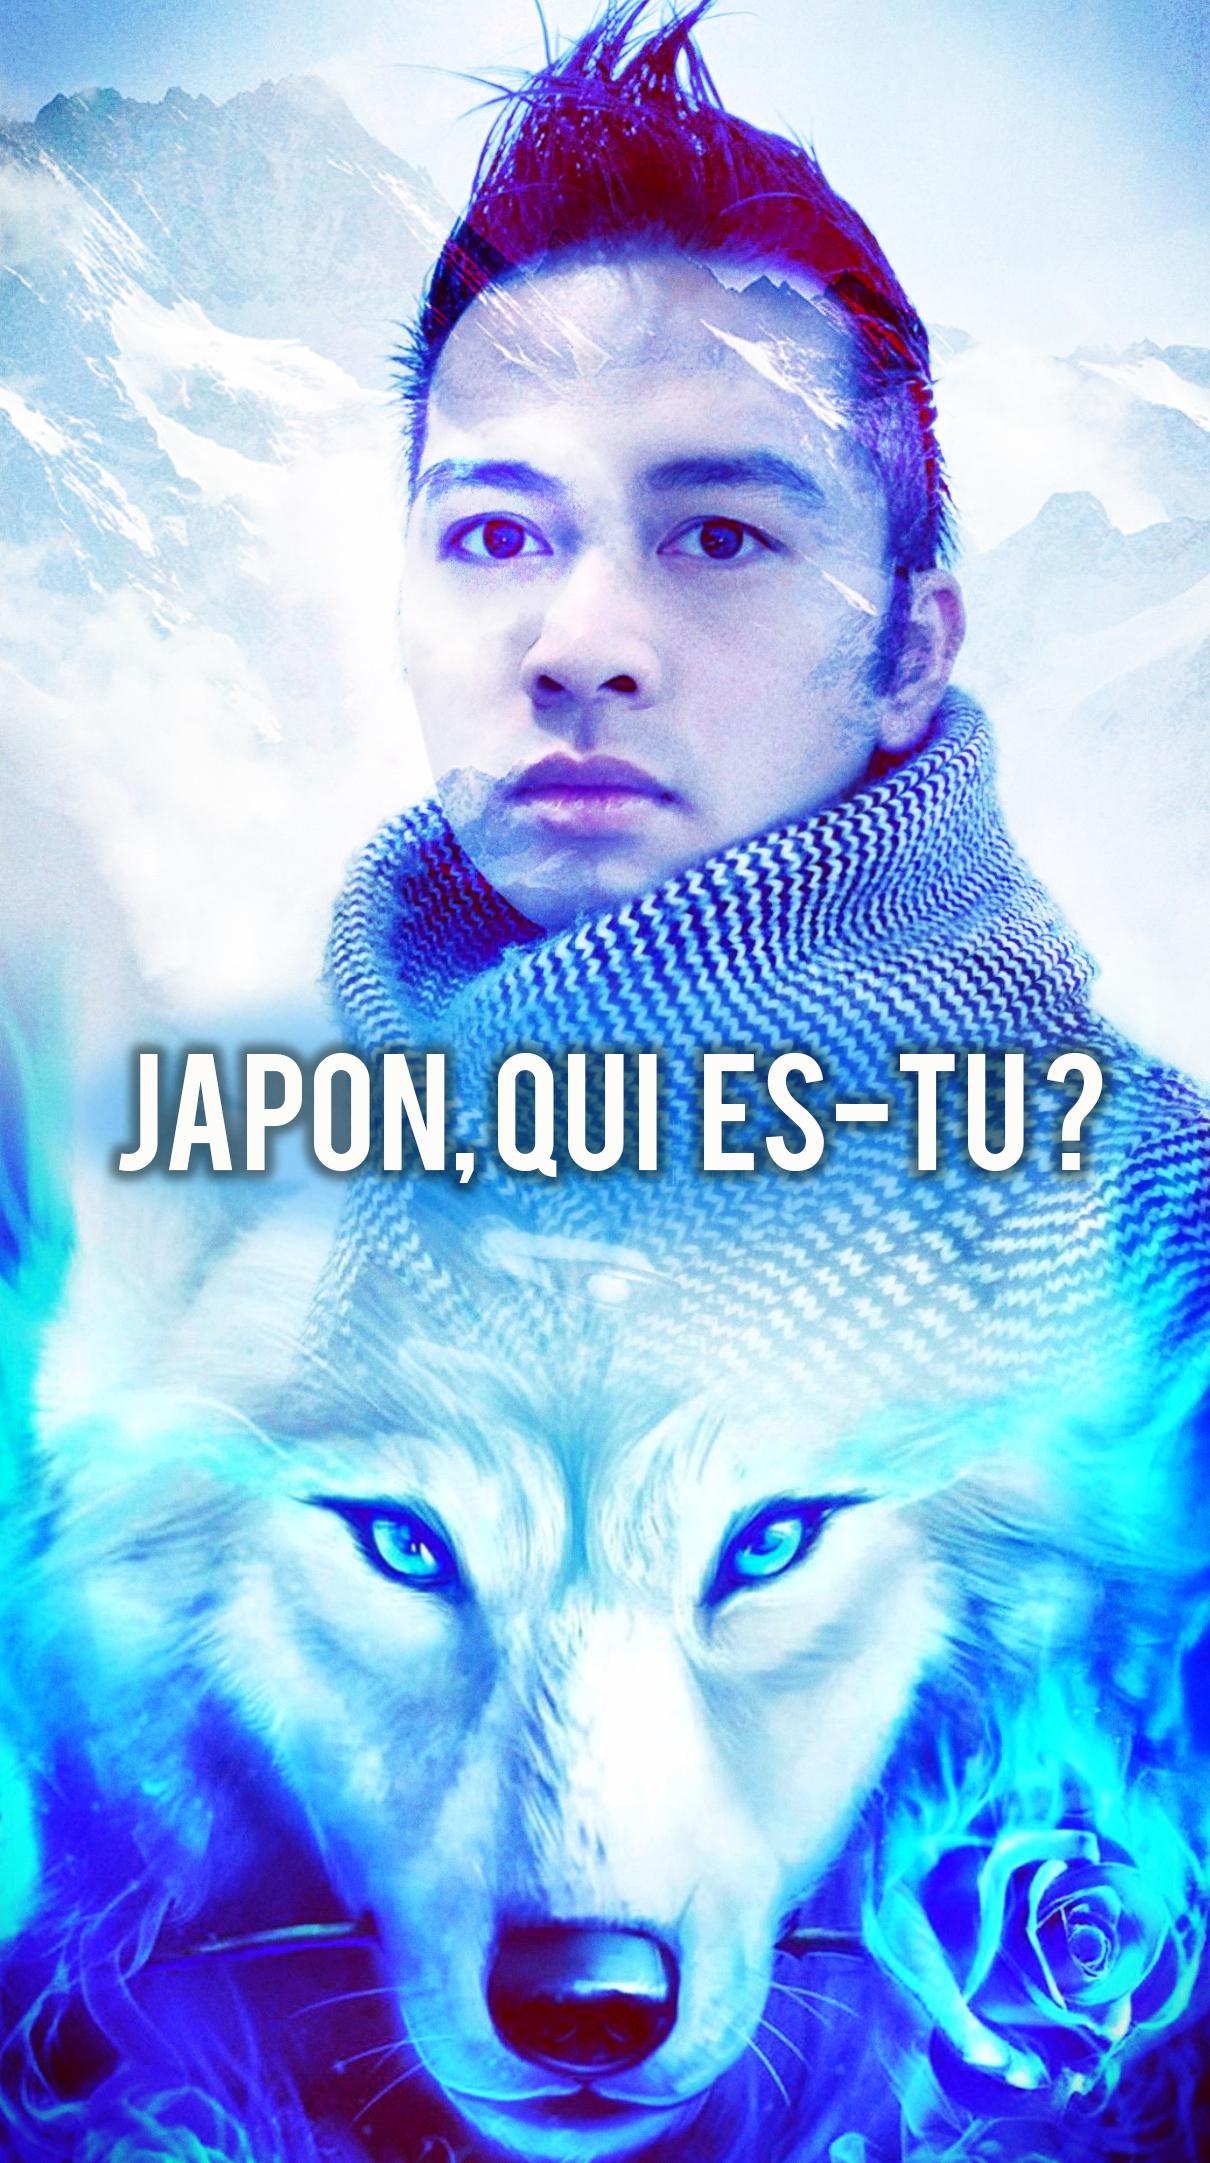 Le Loup David-Minh TRA Japon qui es-tu